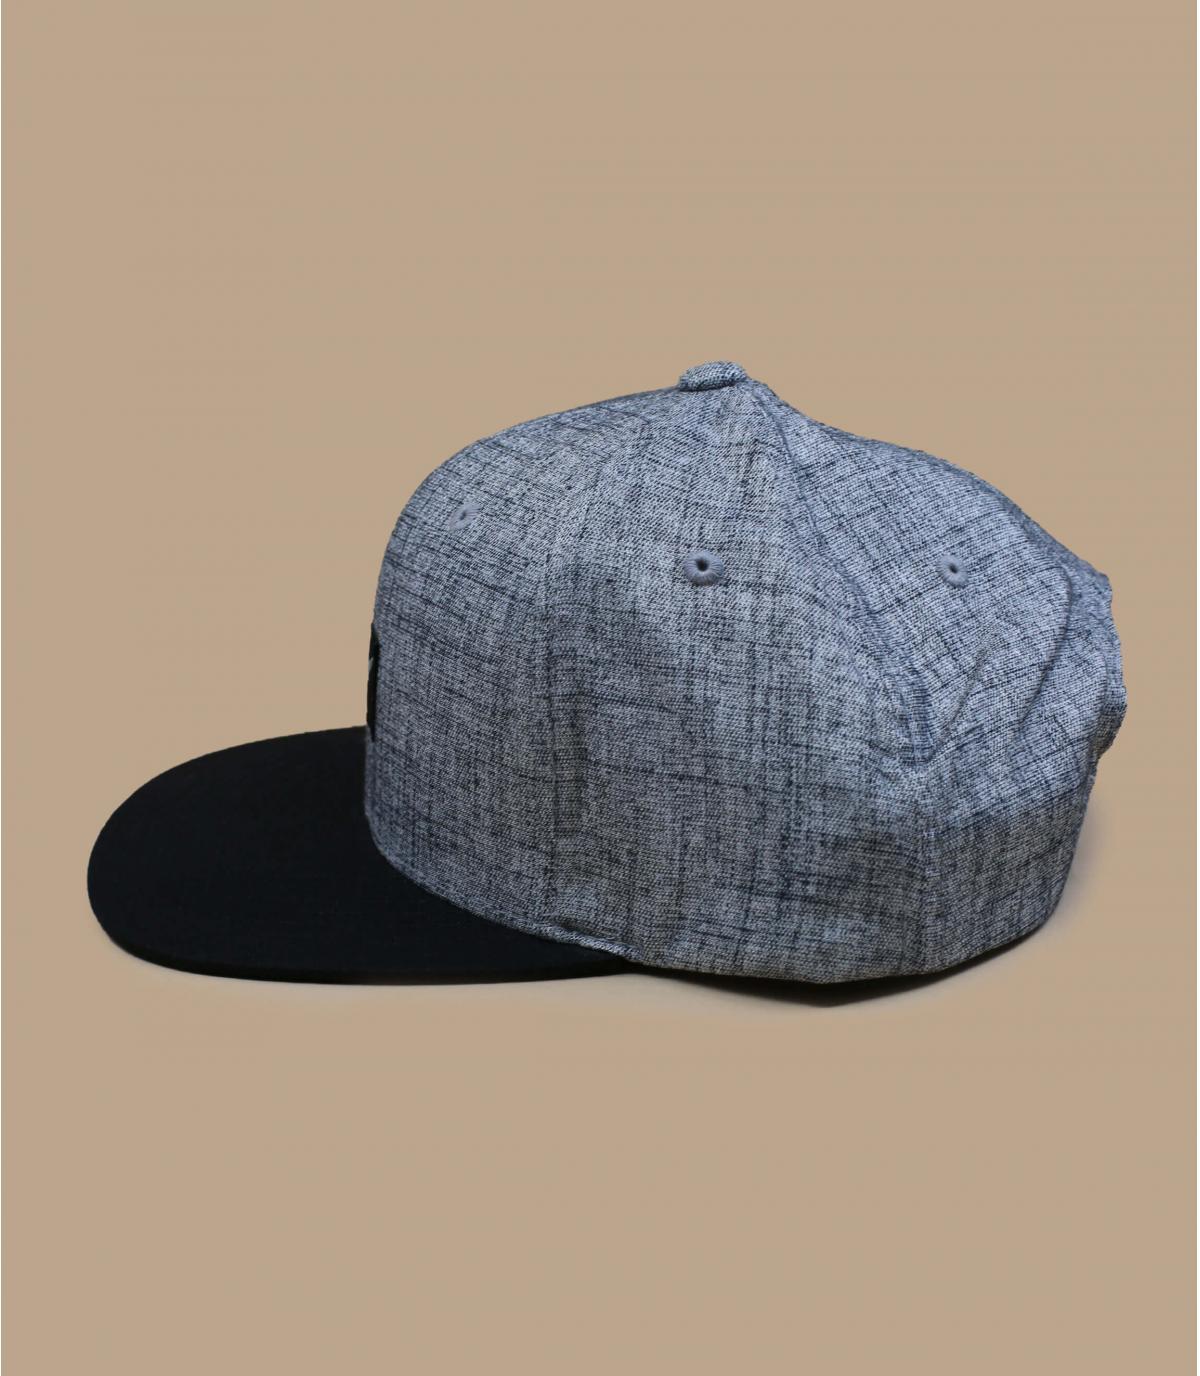 Détails Pitchout heather grey washed black - image 4